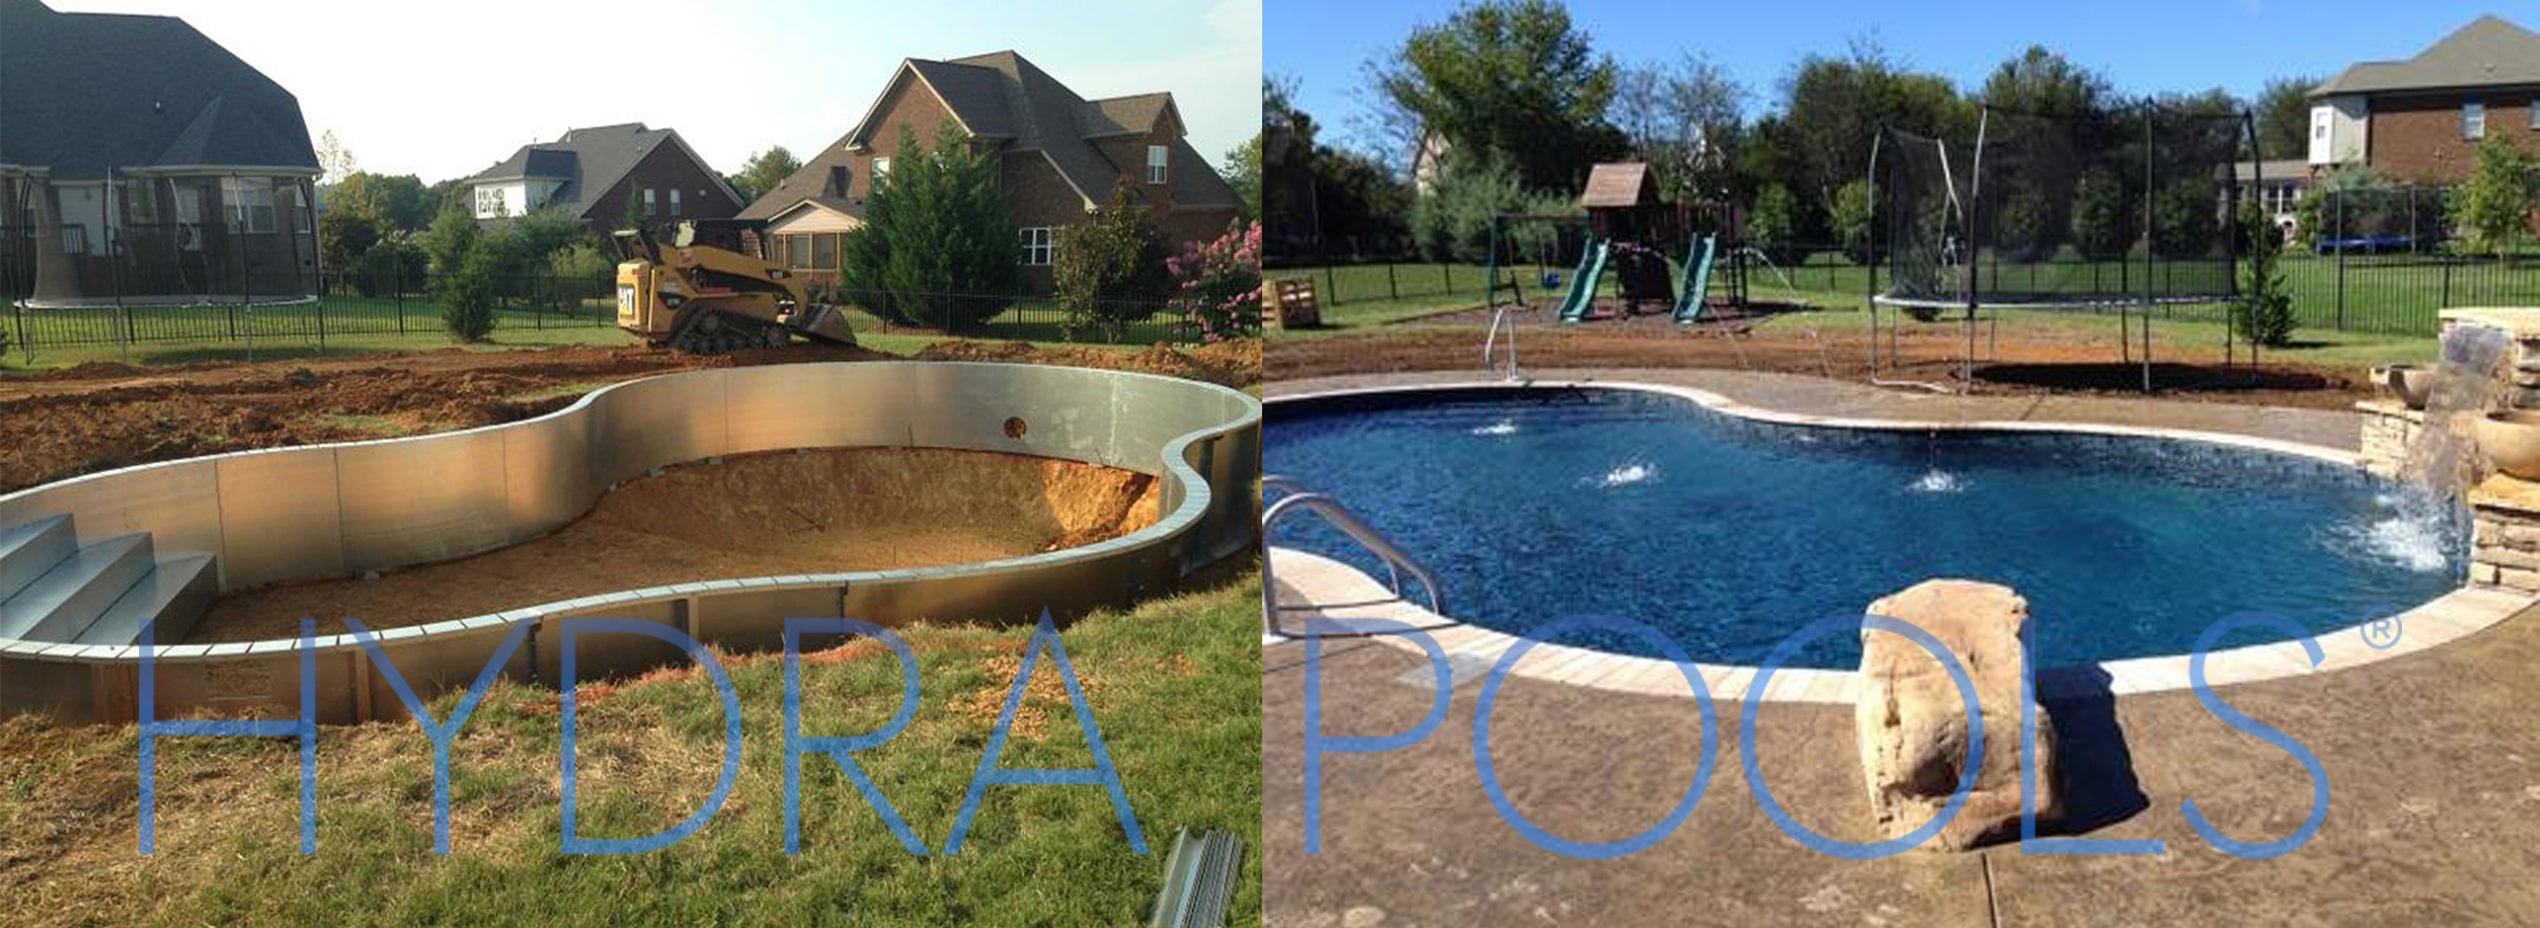 Inground Swimming Pools By Hydra Pools